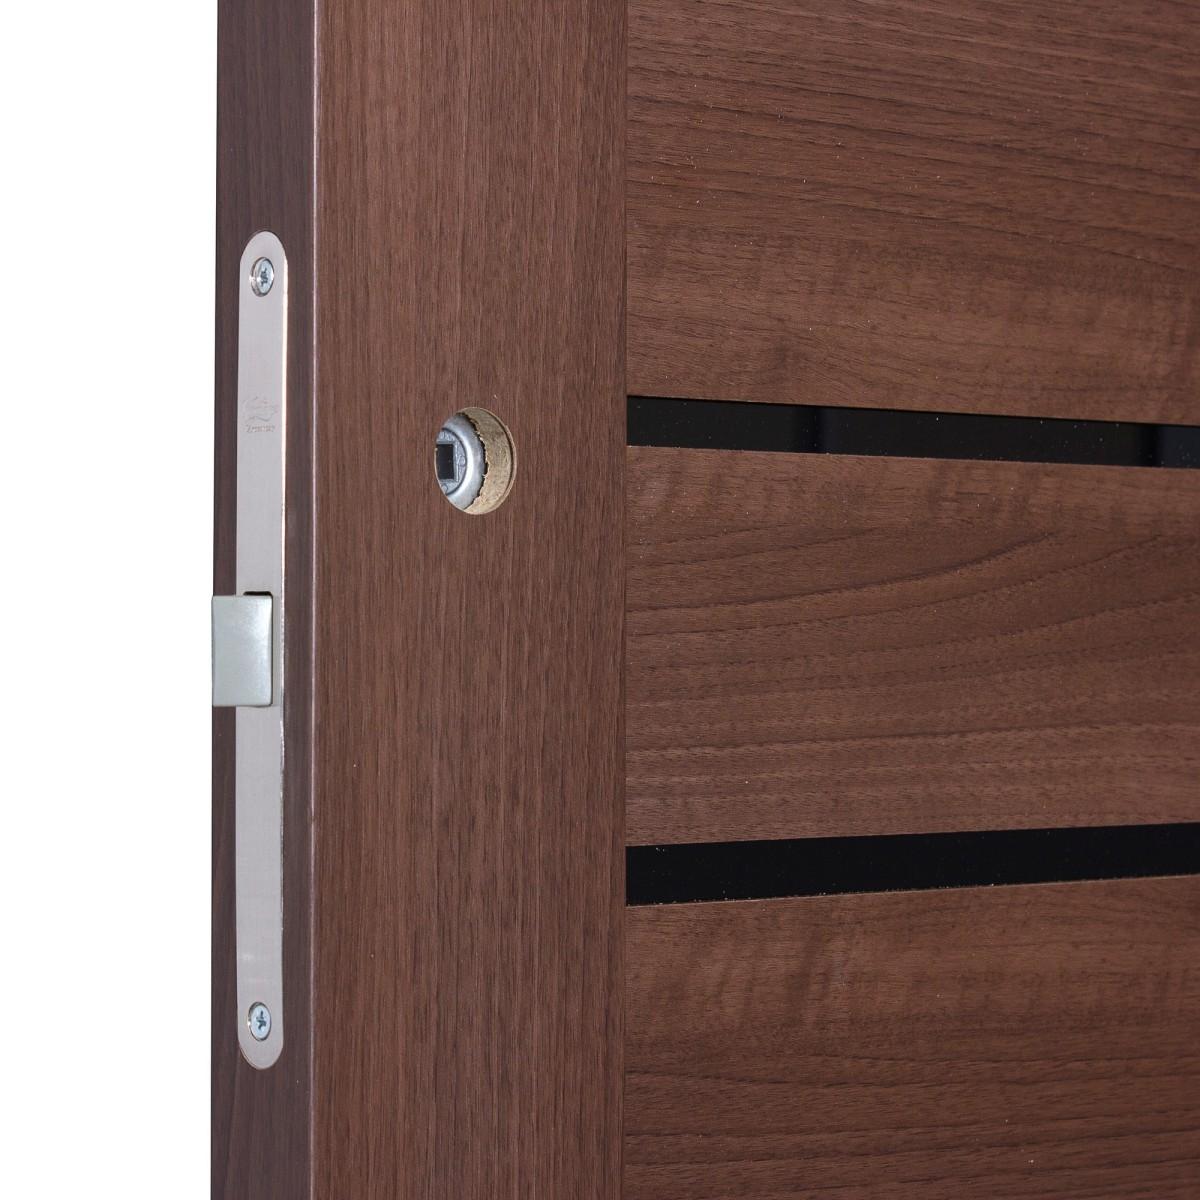 Дверь Межкомнатная Глухая Artens Велдон 70x200 Цвет Мокко Без Фурнитуры